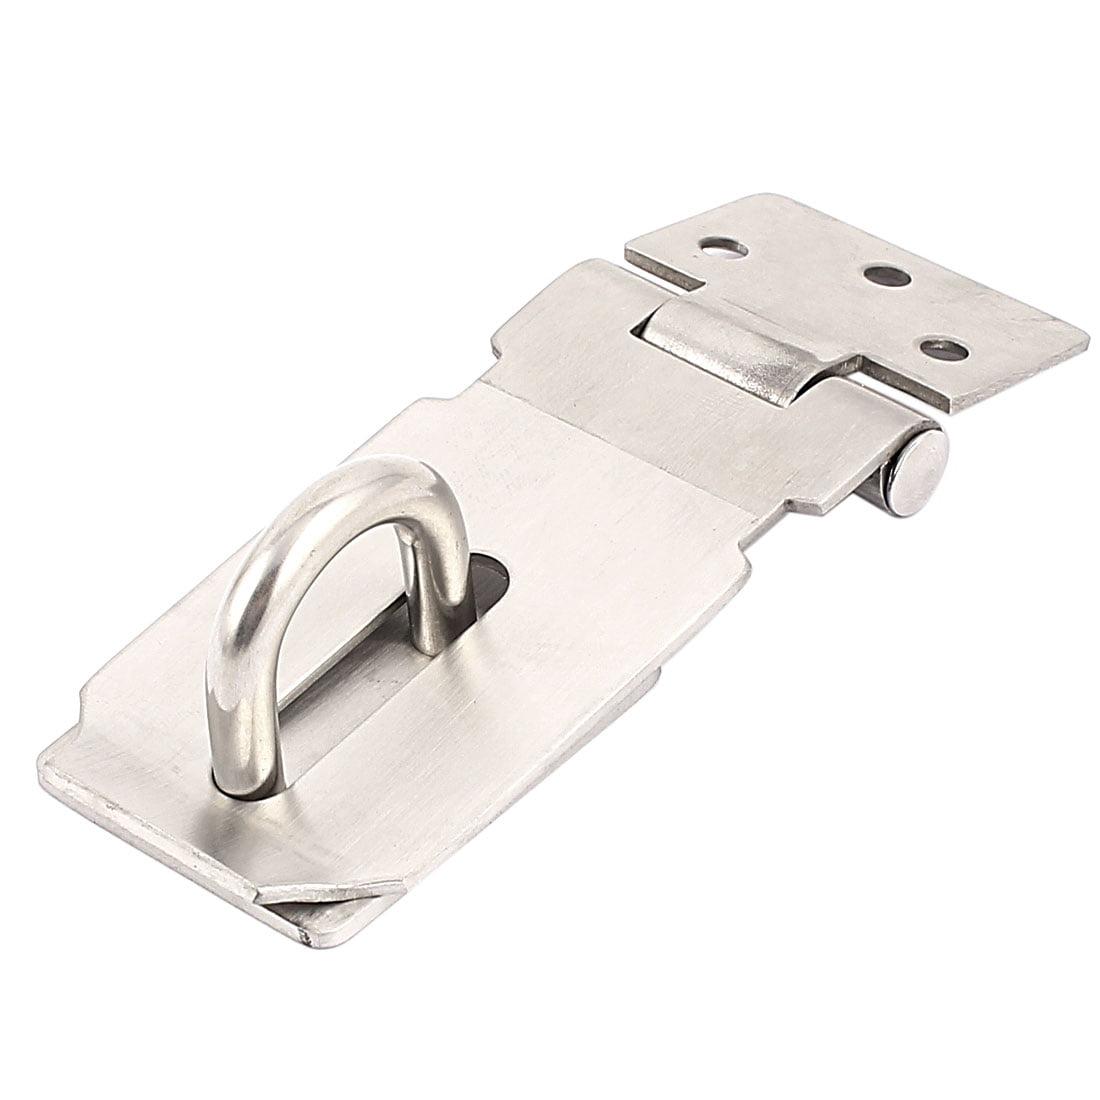 Cupboard Gates Safety Padlock Latch Metal Door Hasp Staple Silver Tone 2 Sets